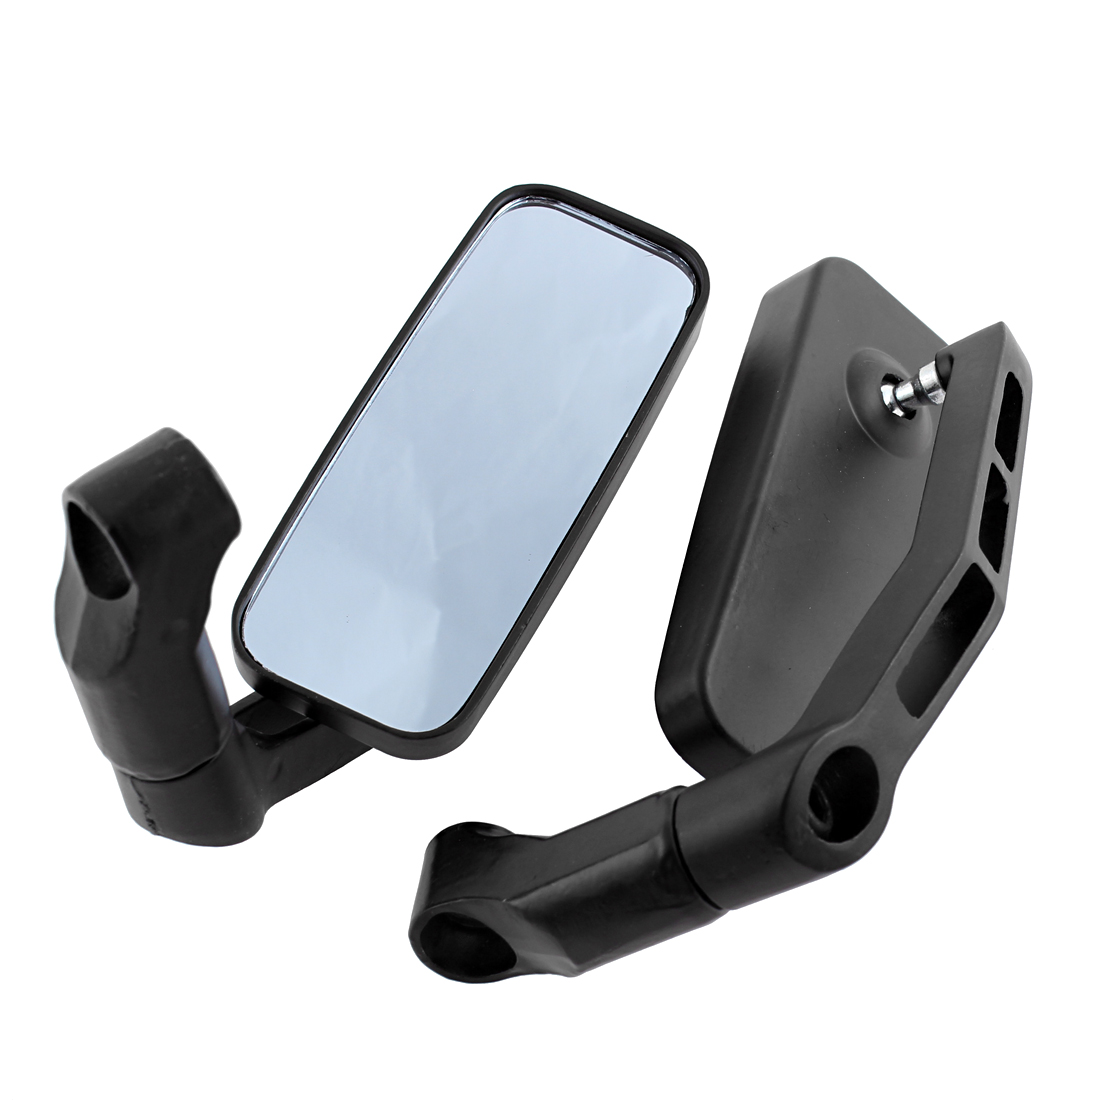 Pair Black Aluminum Casing Motorcycle Side Rearview Blind Spot Blue Mirror